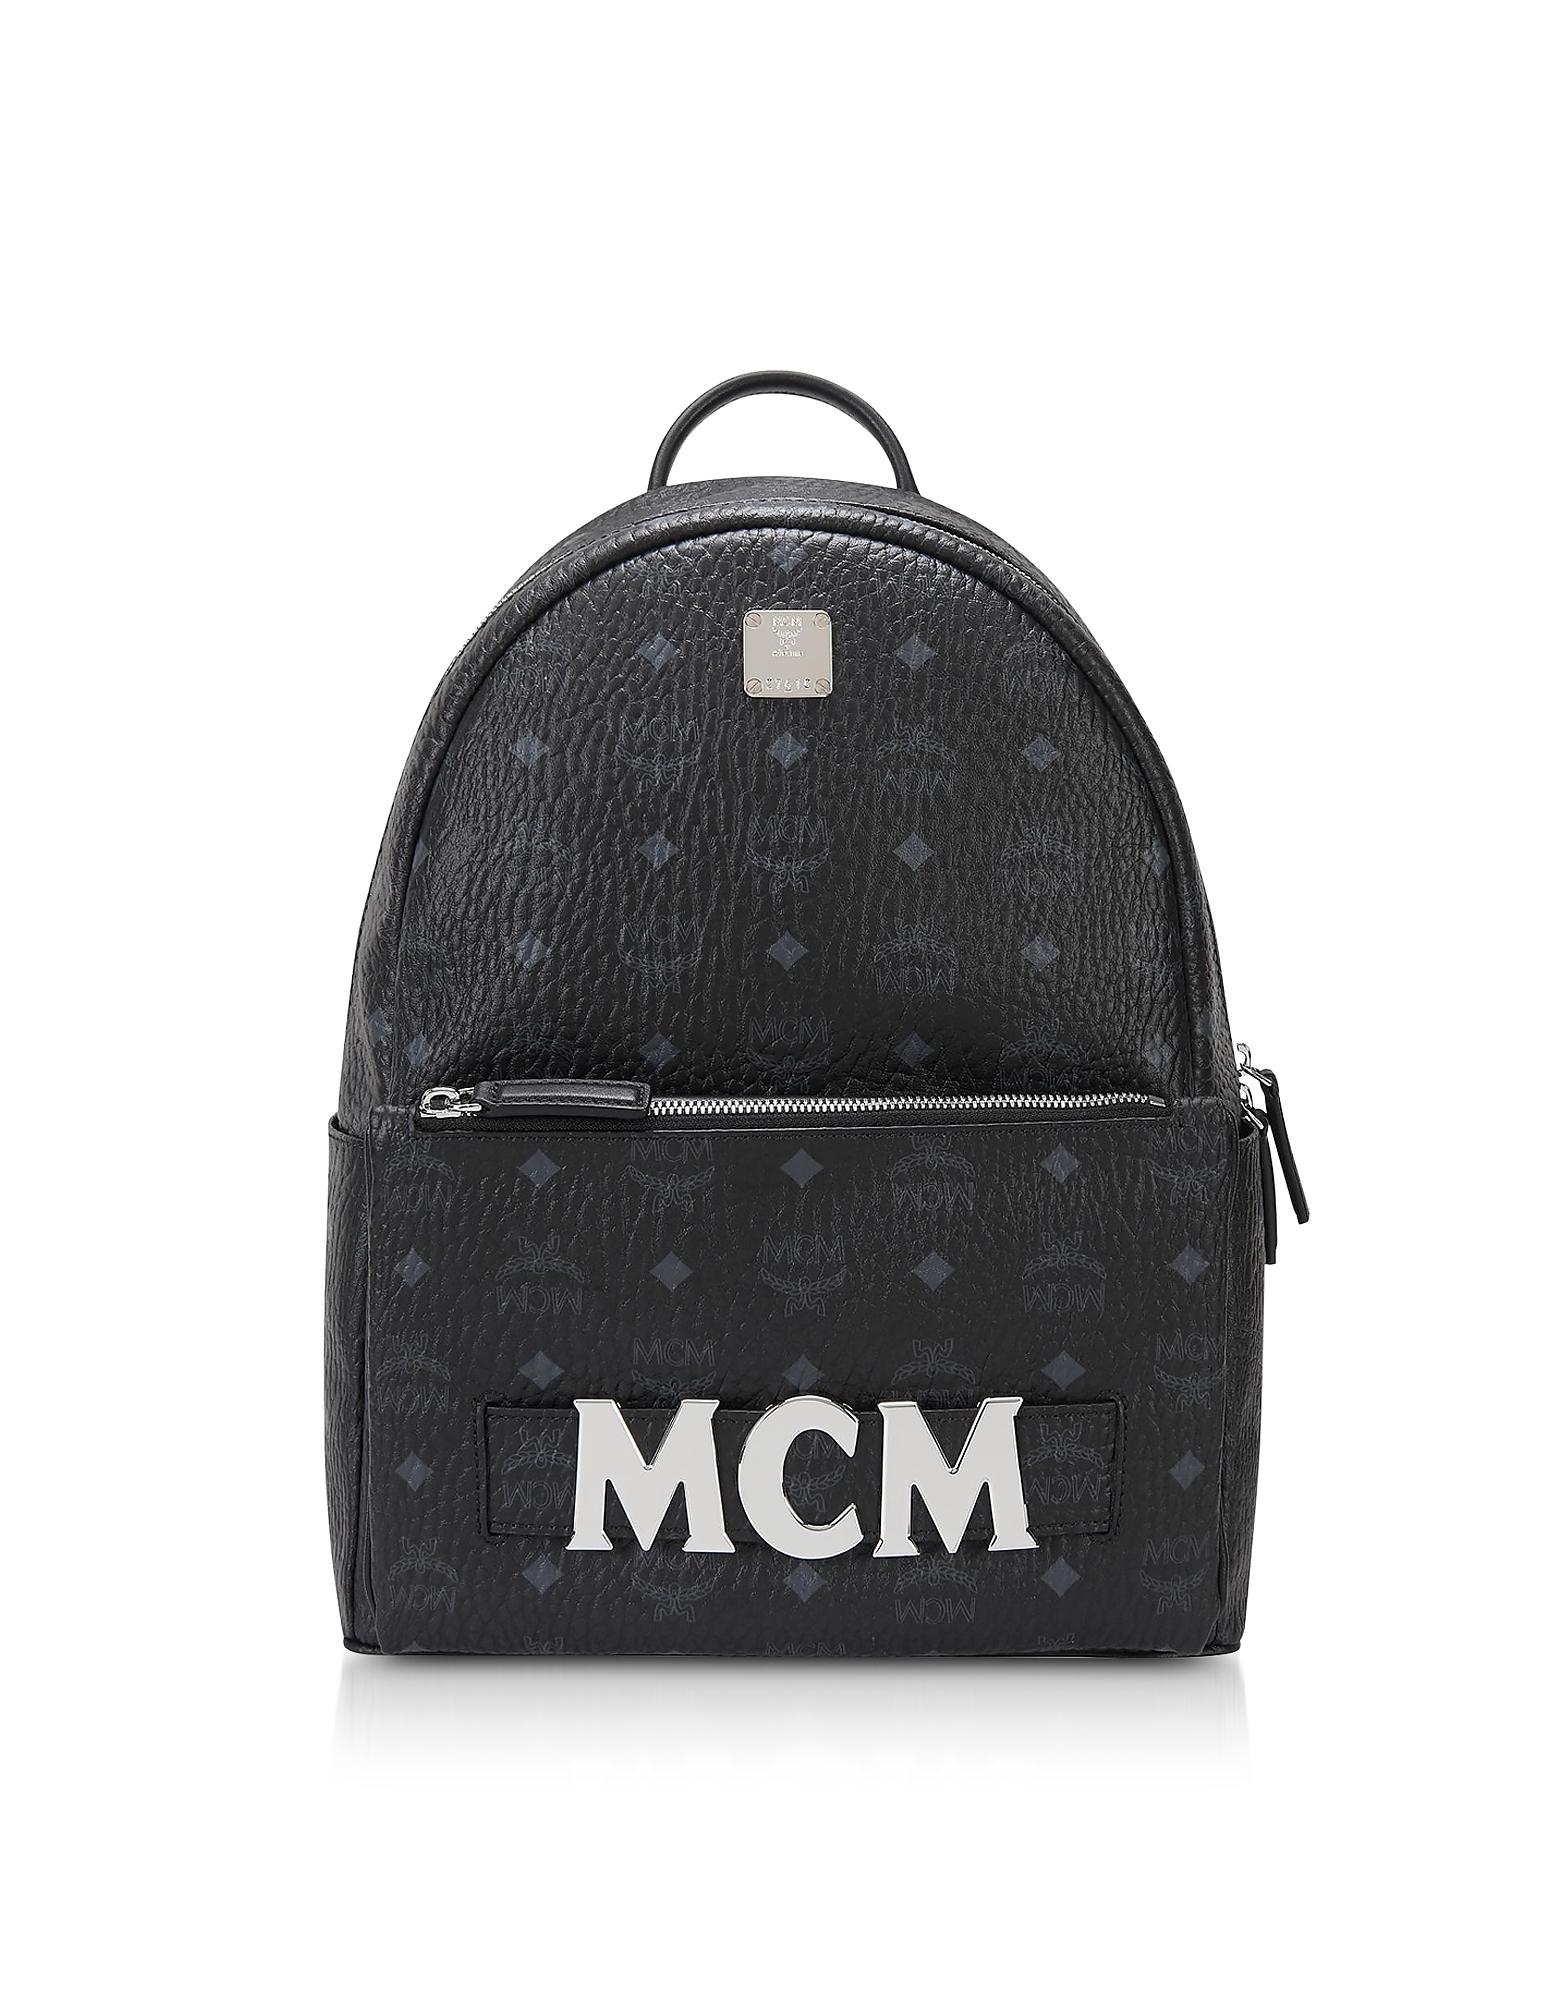 Black Trilogie Stark Small/Medium Backpack